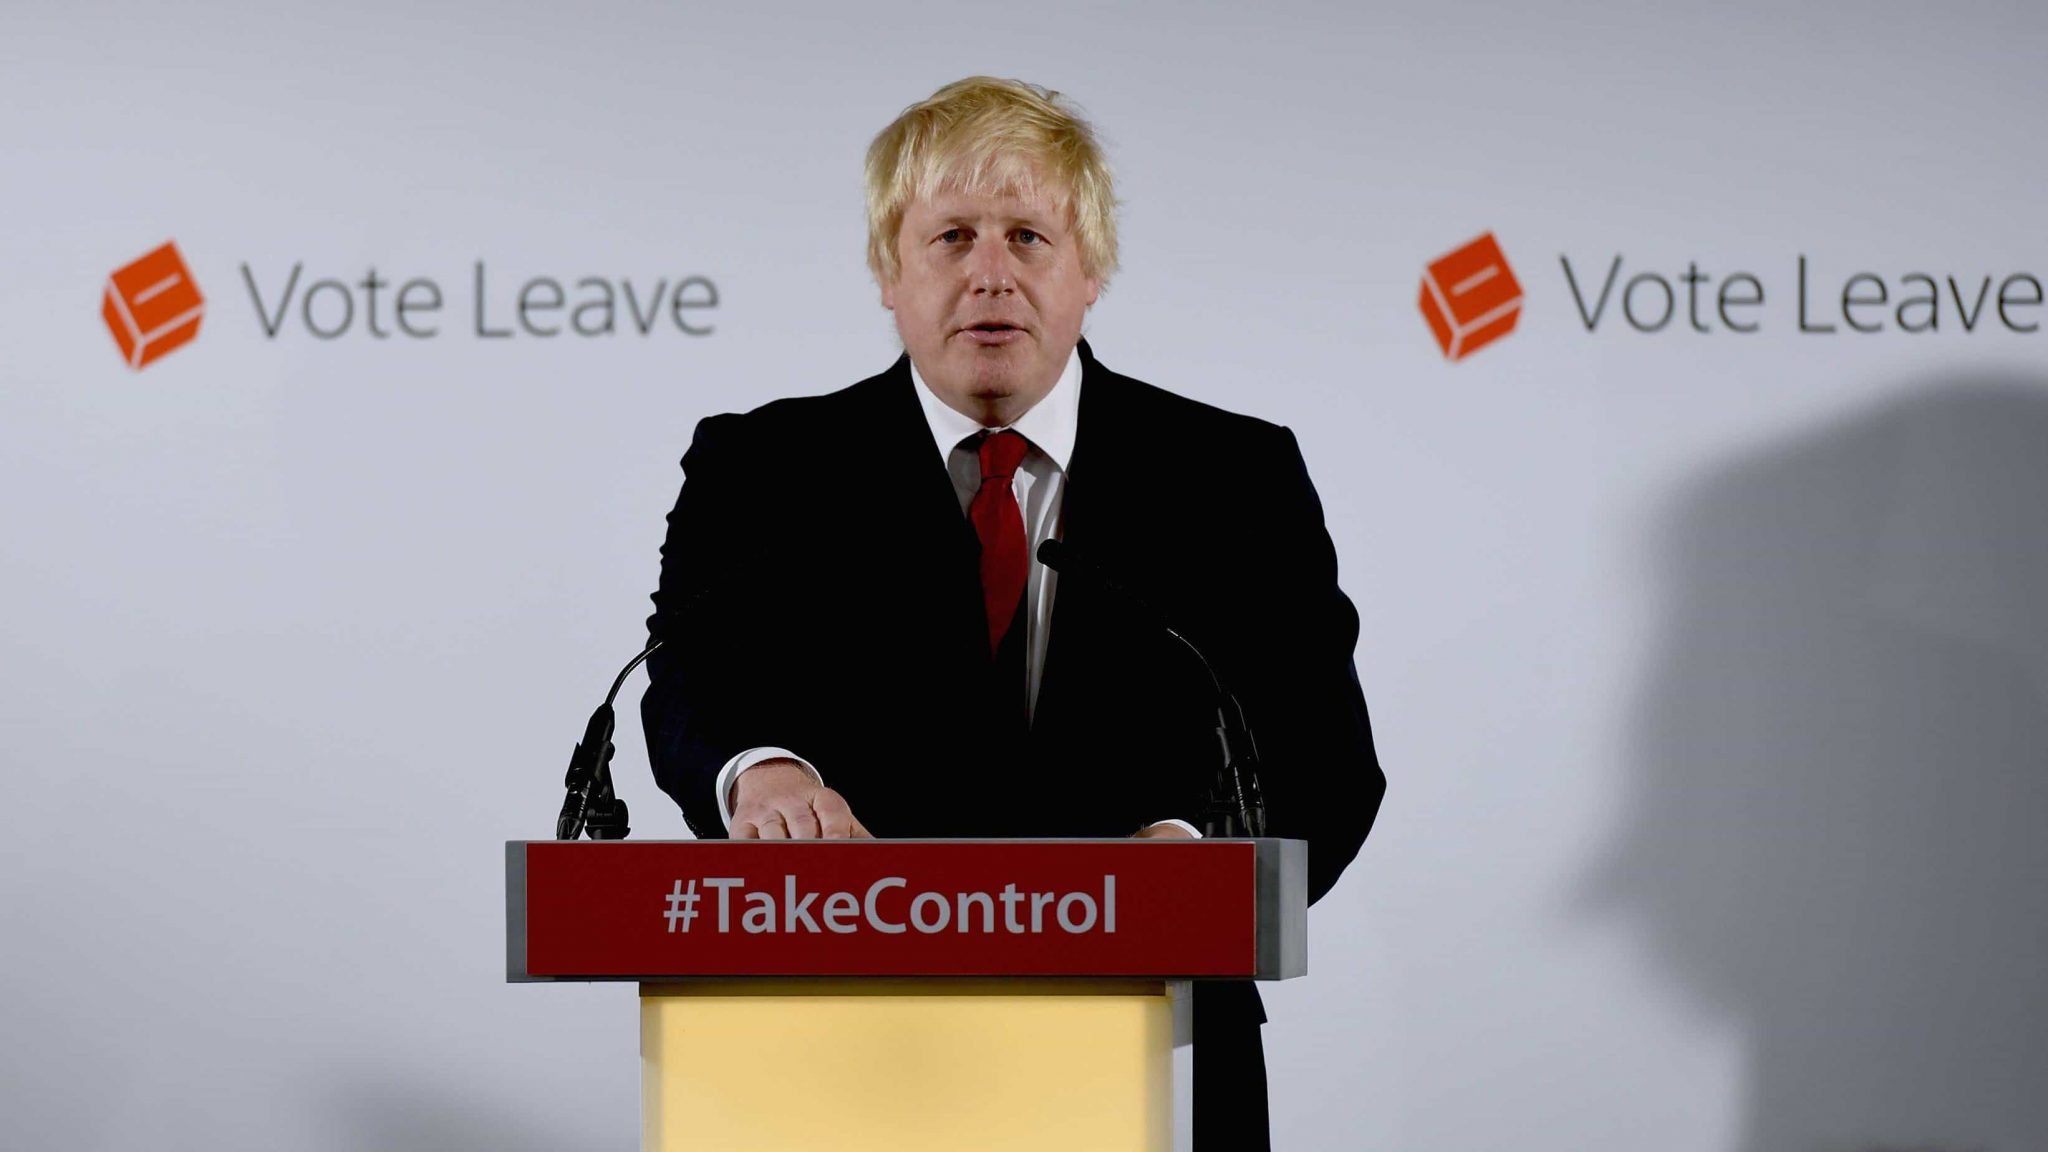 Boris Johnson campaigning for Vote Leave (PA)